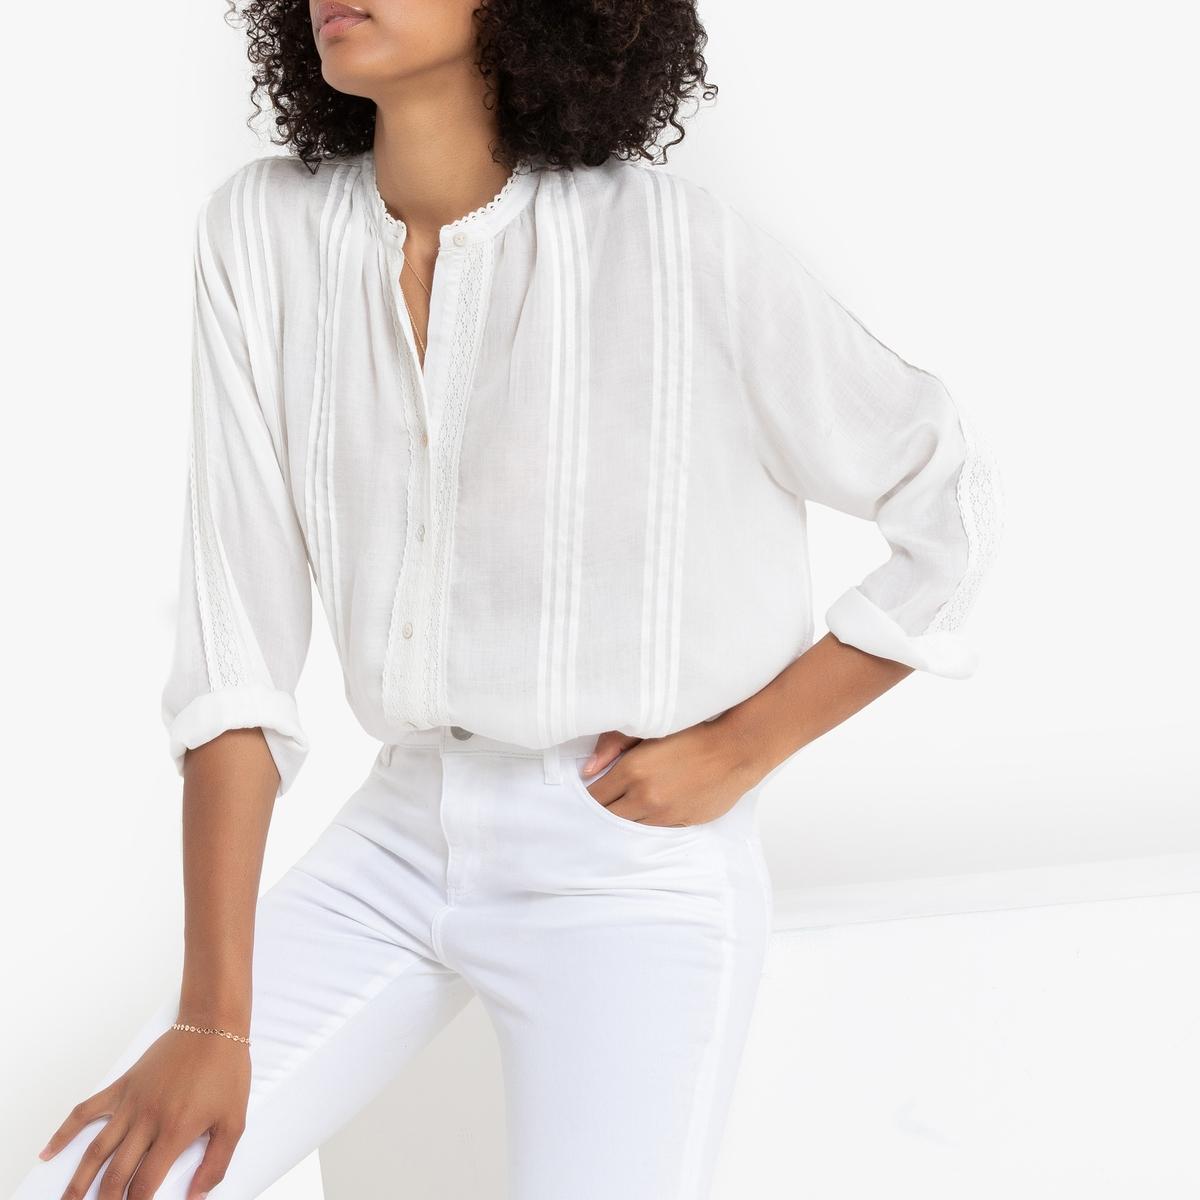 Blusa con cuello redondo y manga larga